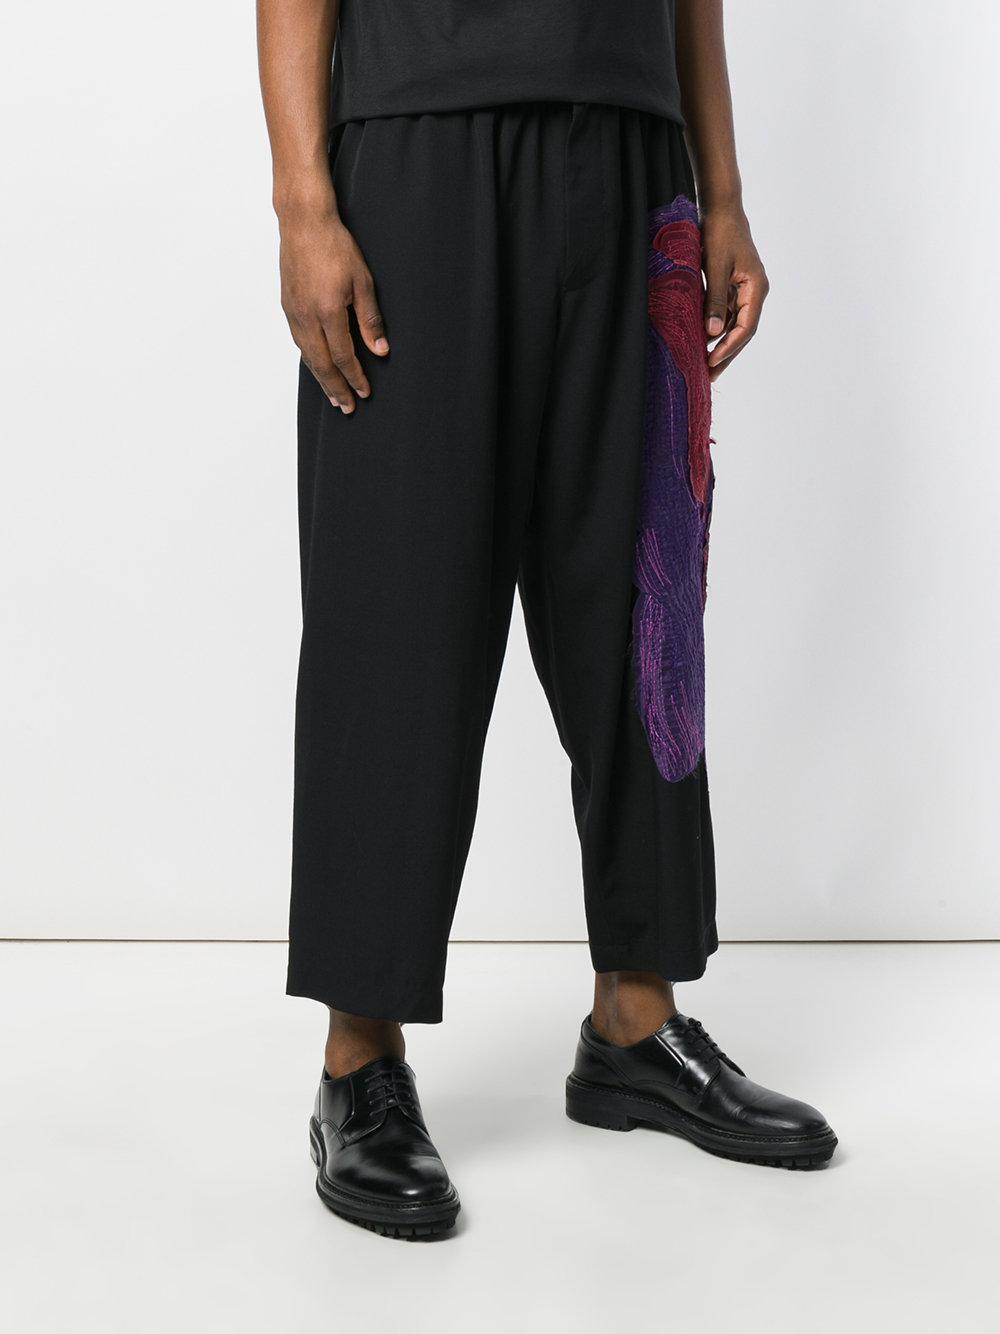 Yohji Yamamoto Wool Loose Fit Logoed Trousers in Blue for Men